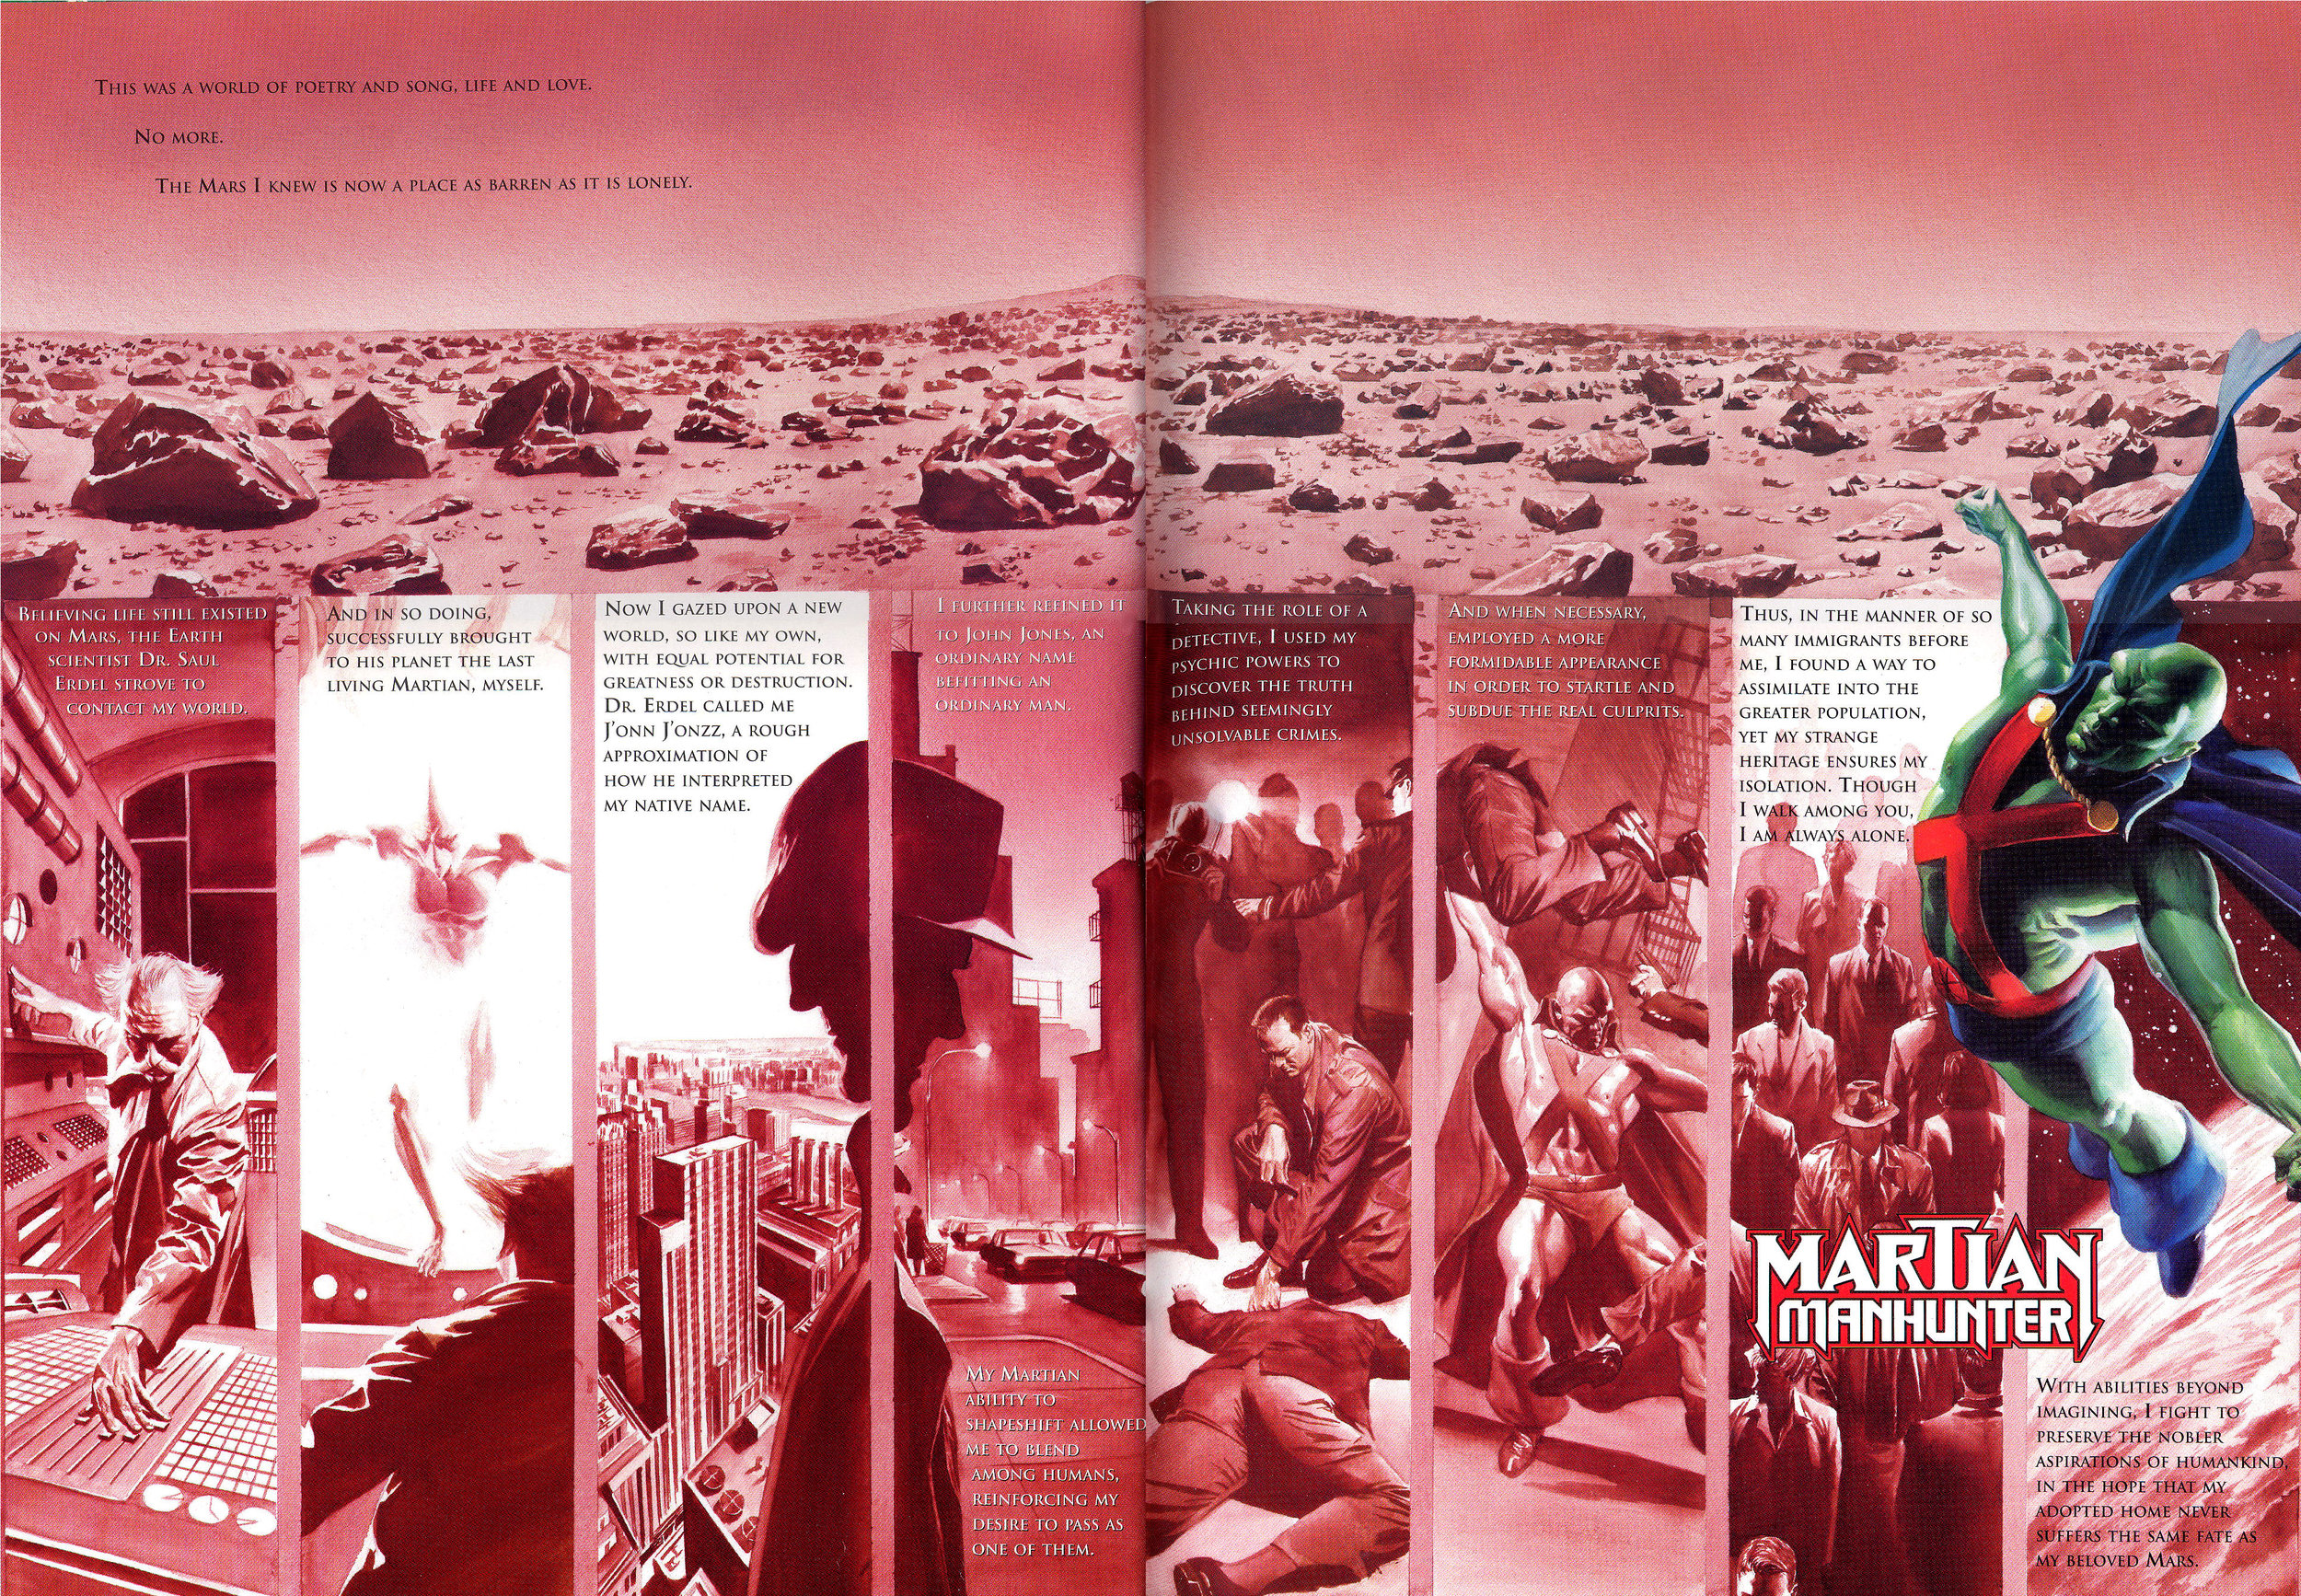 JLA: Secret Origins (2002) Martian Manhunter, written by Paul Dini with art by Alex Ross.